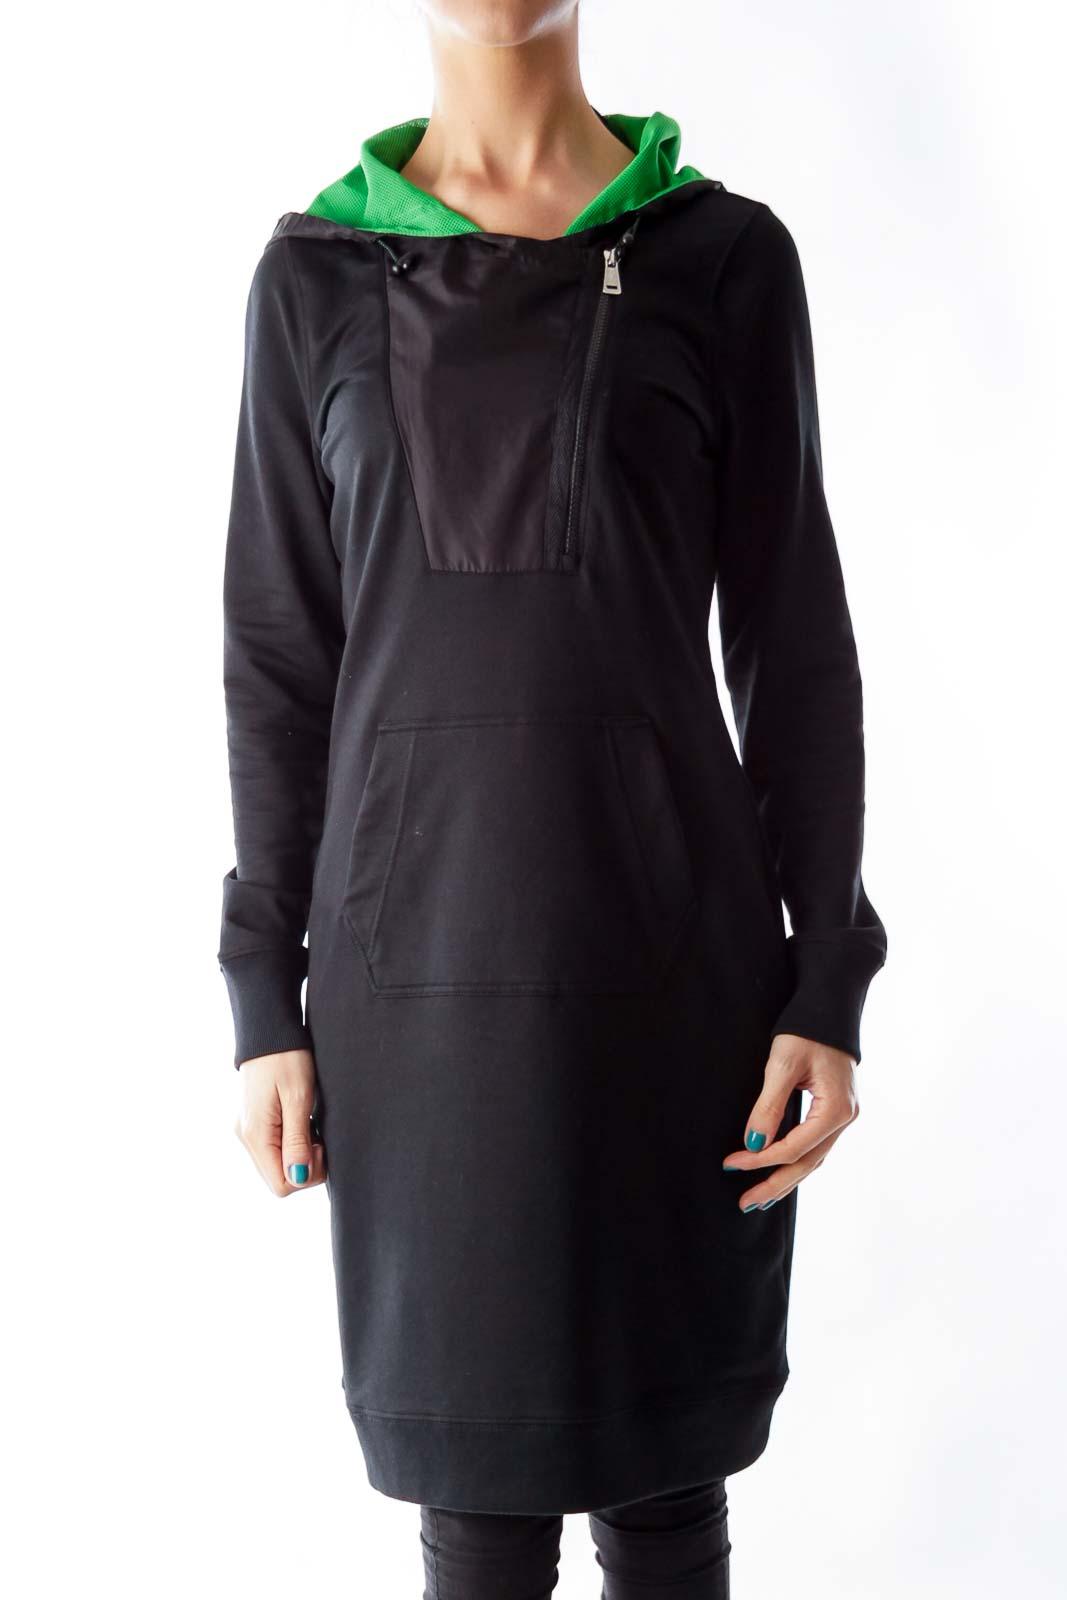 Black & Green Sports Dress Front